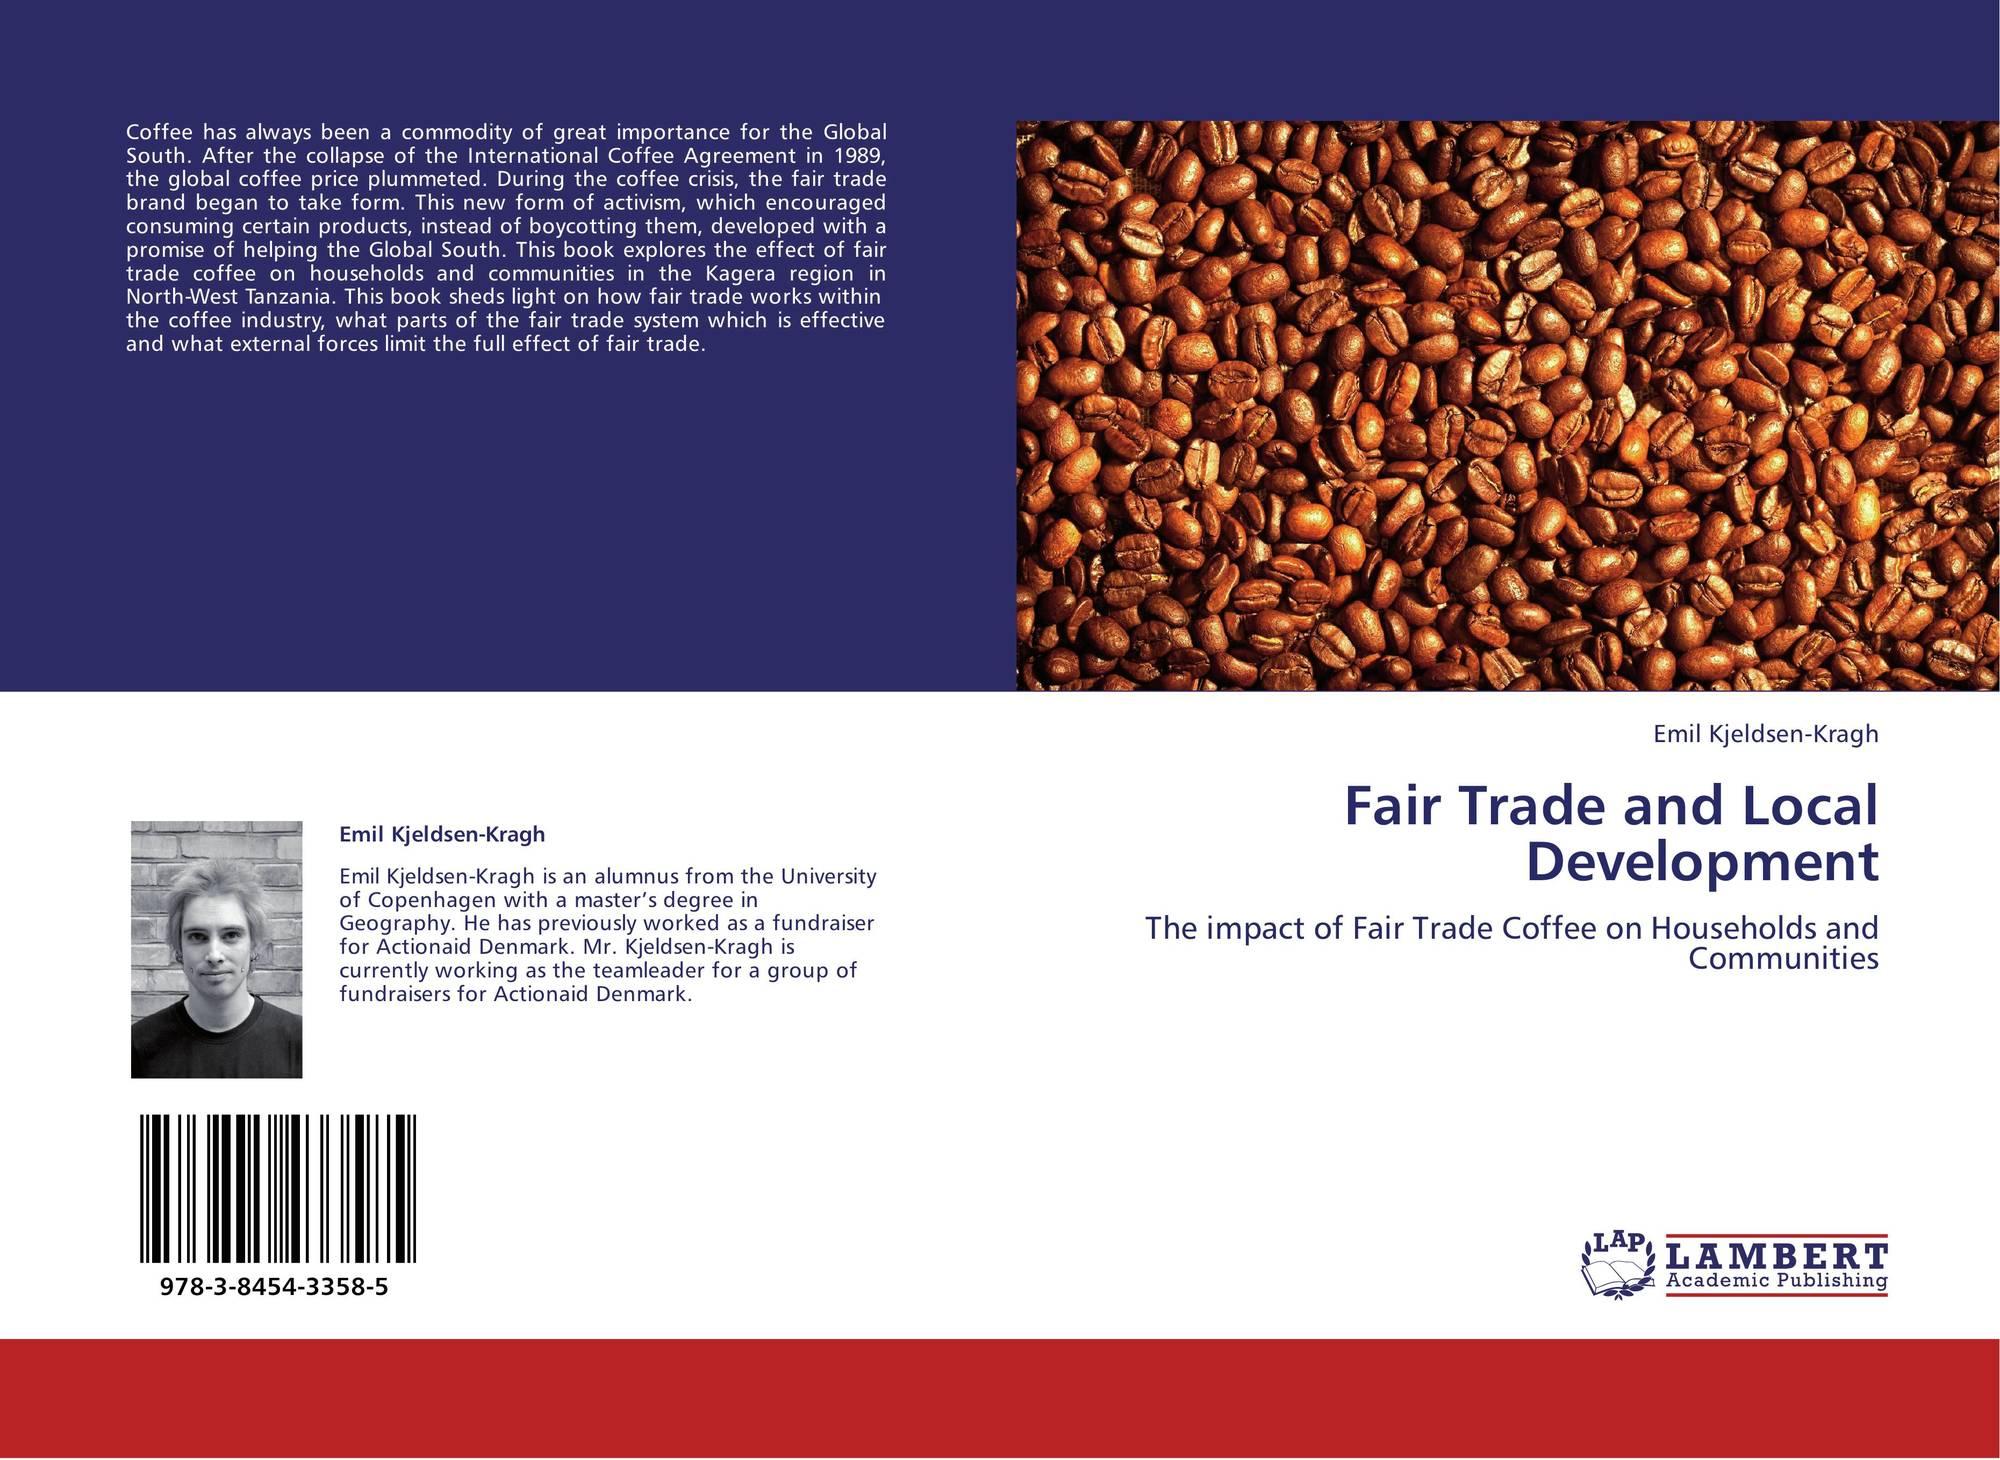 fair trade | History, Criticism, & Facts | Britannica.com